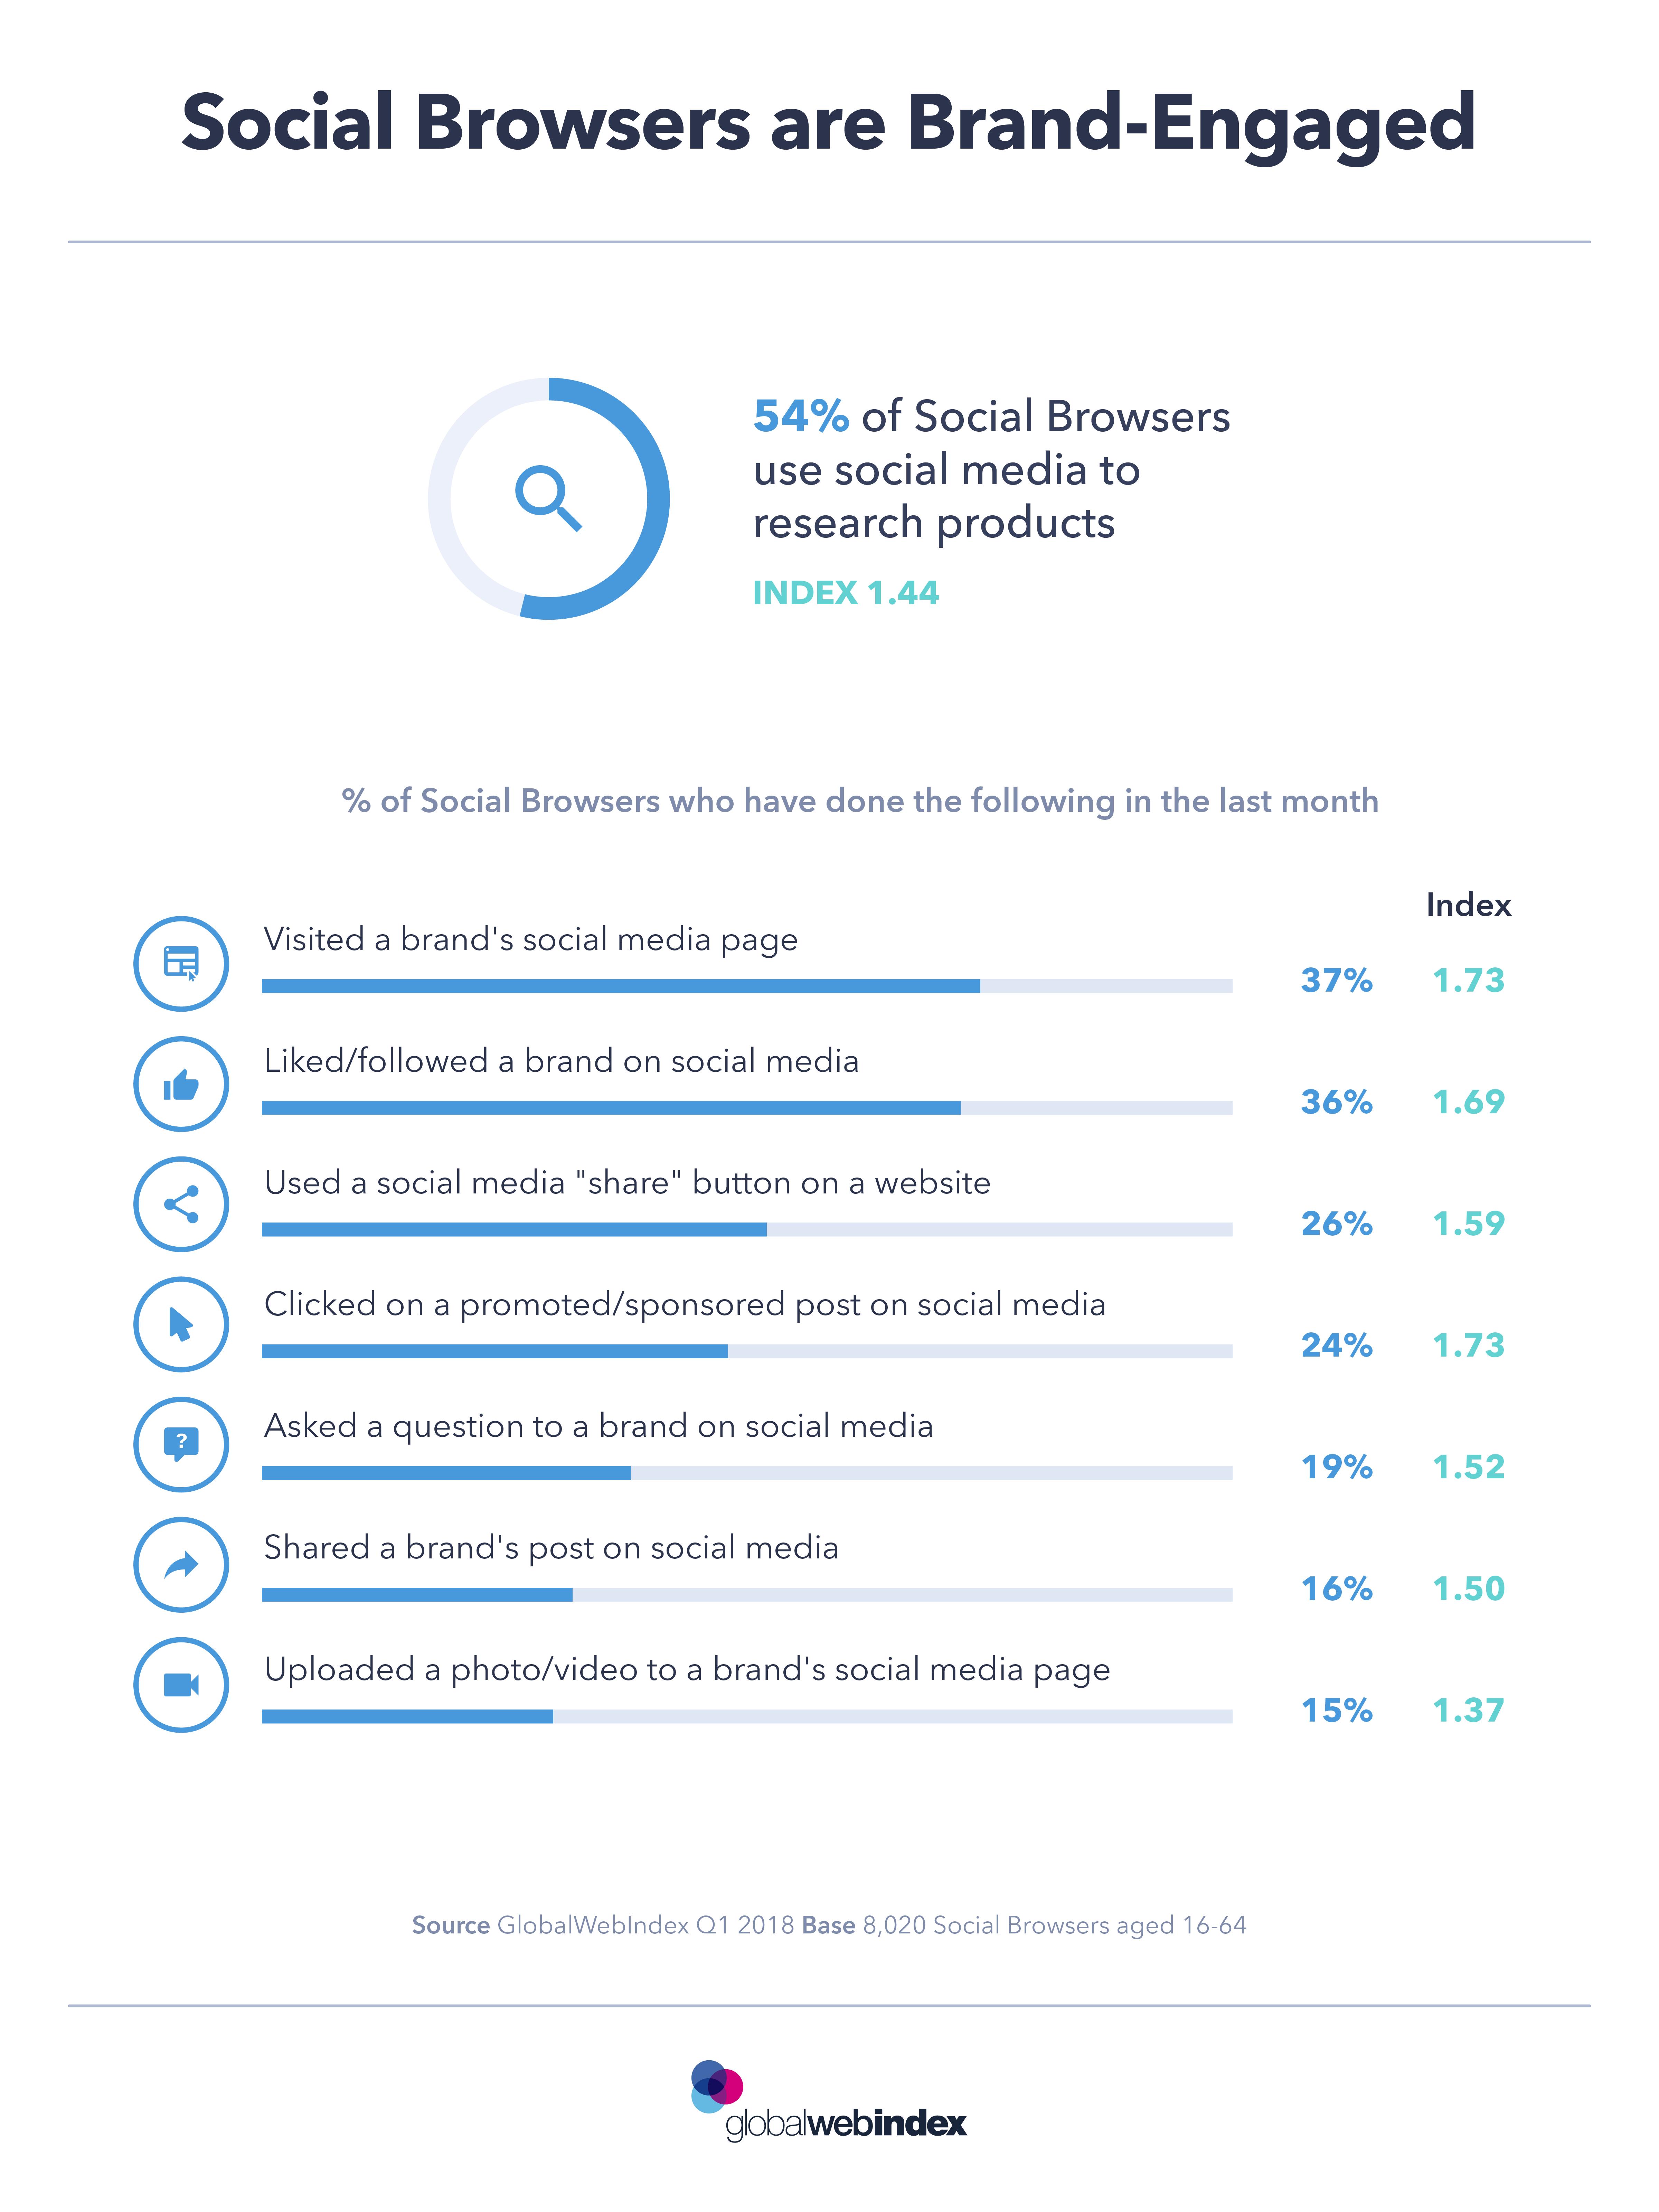 Social Media Habits of Social Browsers, 2018